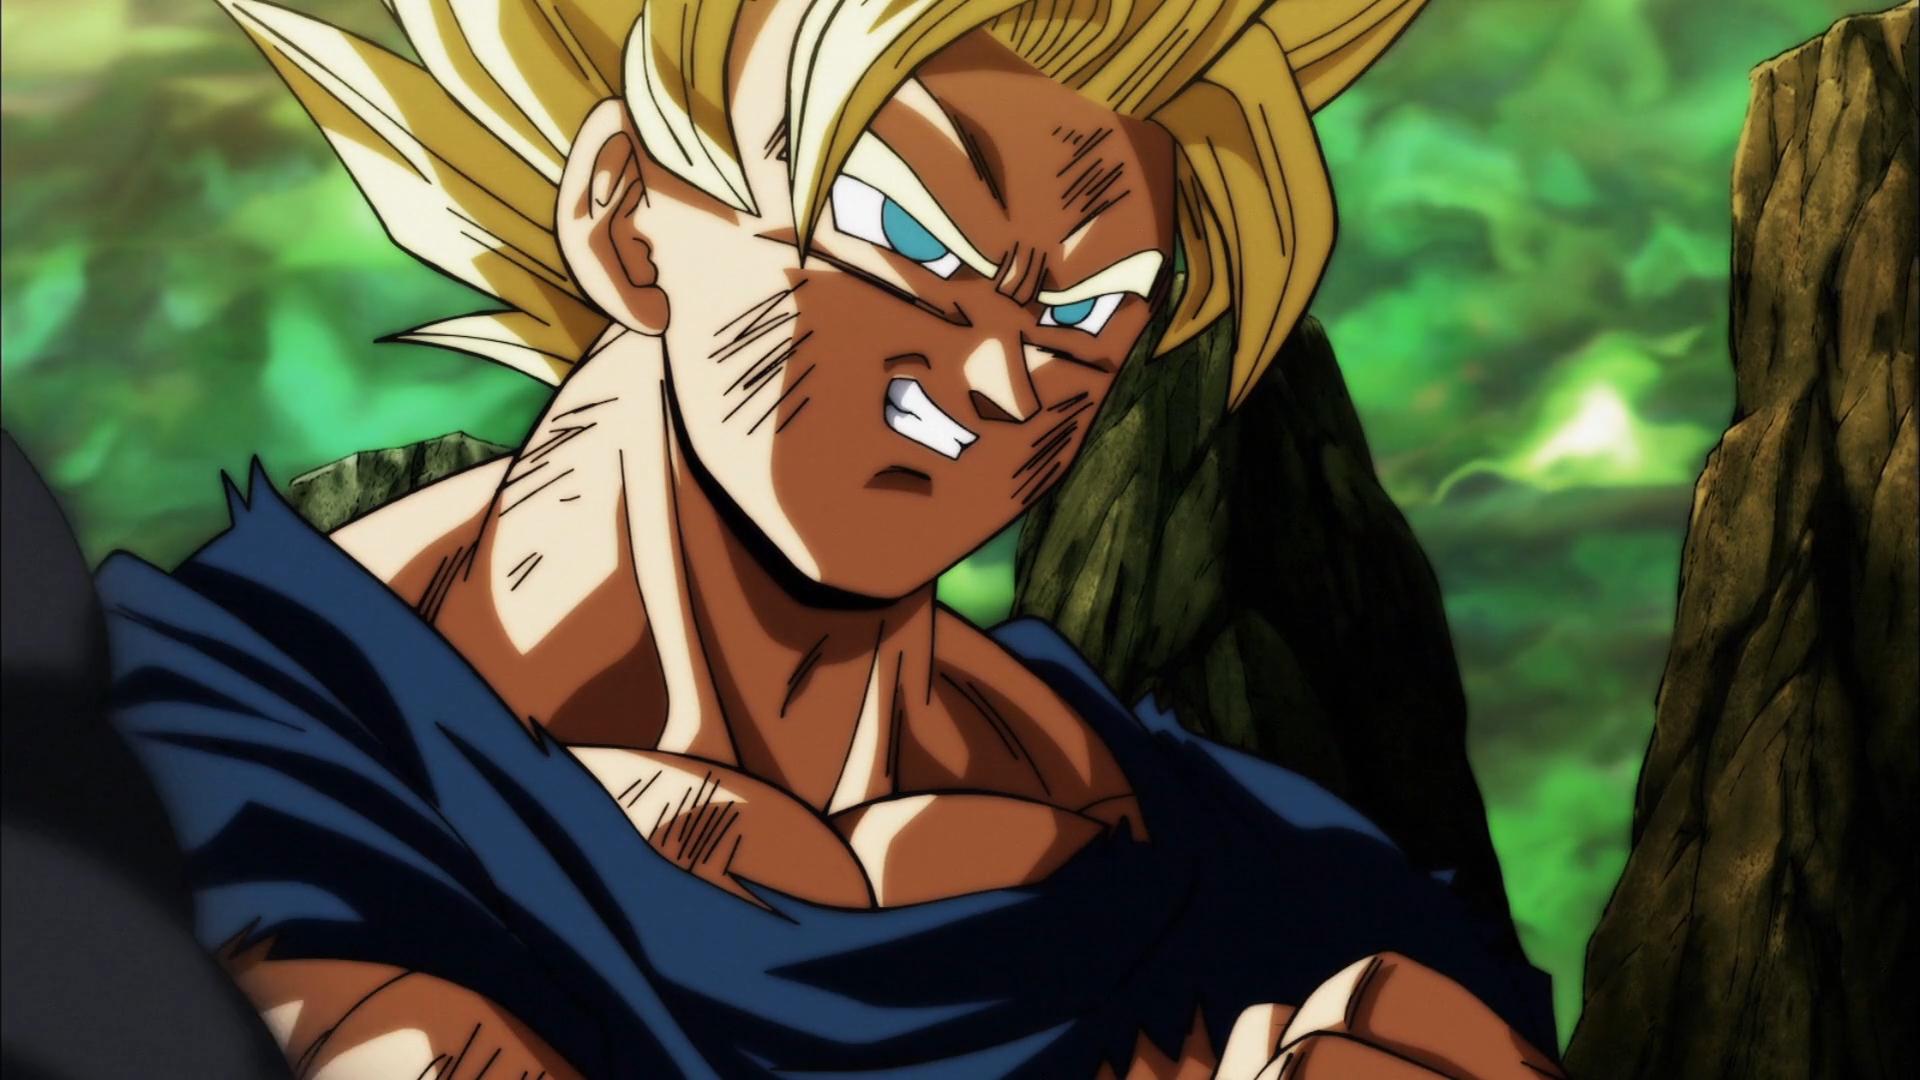 Son Goku Super Saiyan 2 Hd Wallpaper Background Image